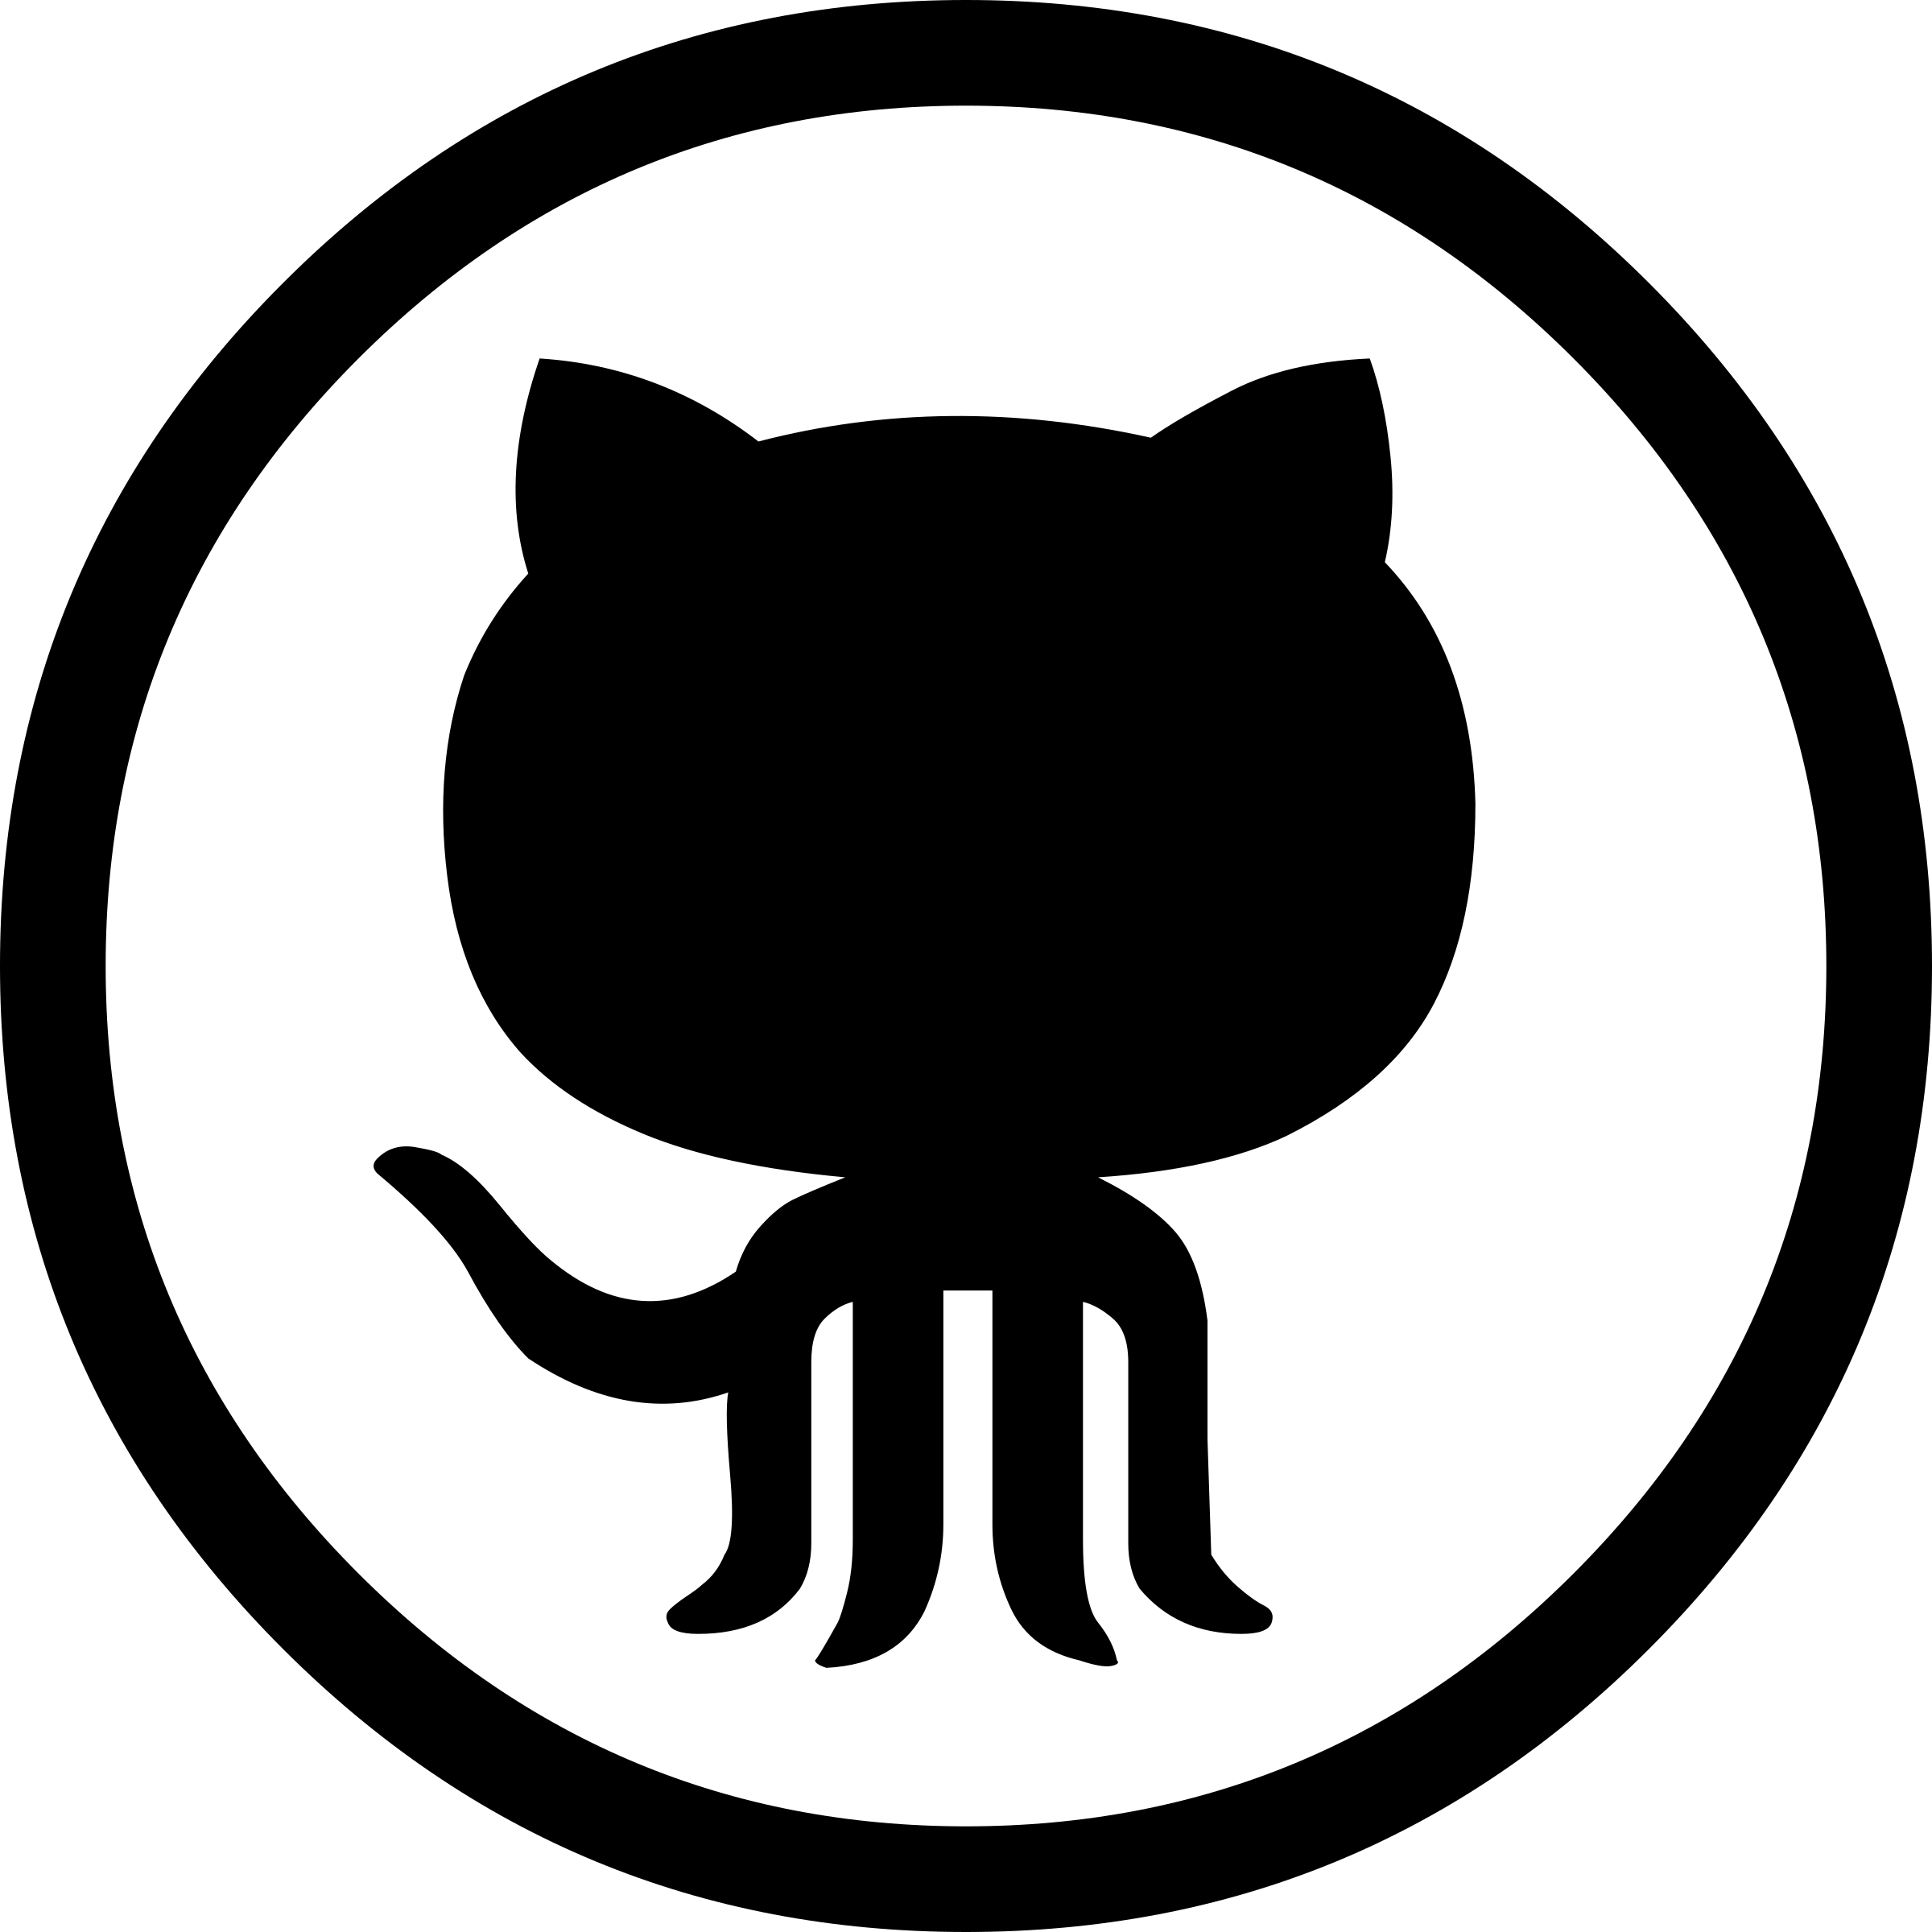 2400x2400 Github Logo Png Transparent Amp Svg Vector